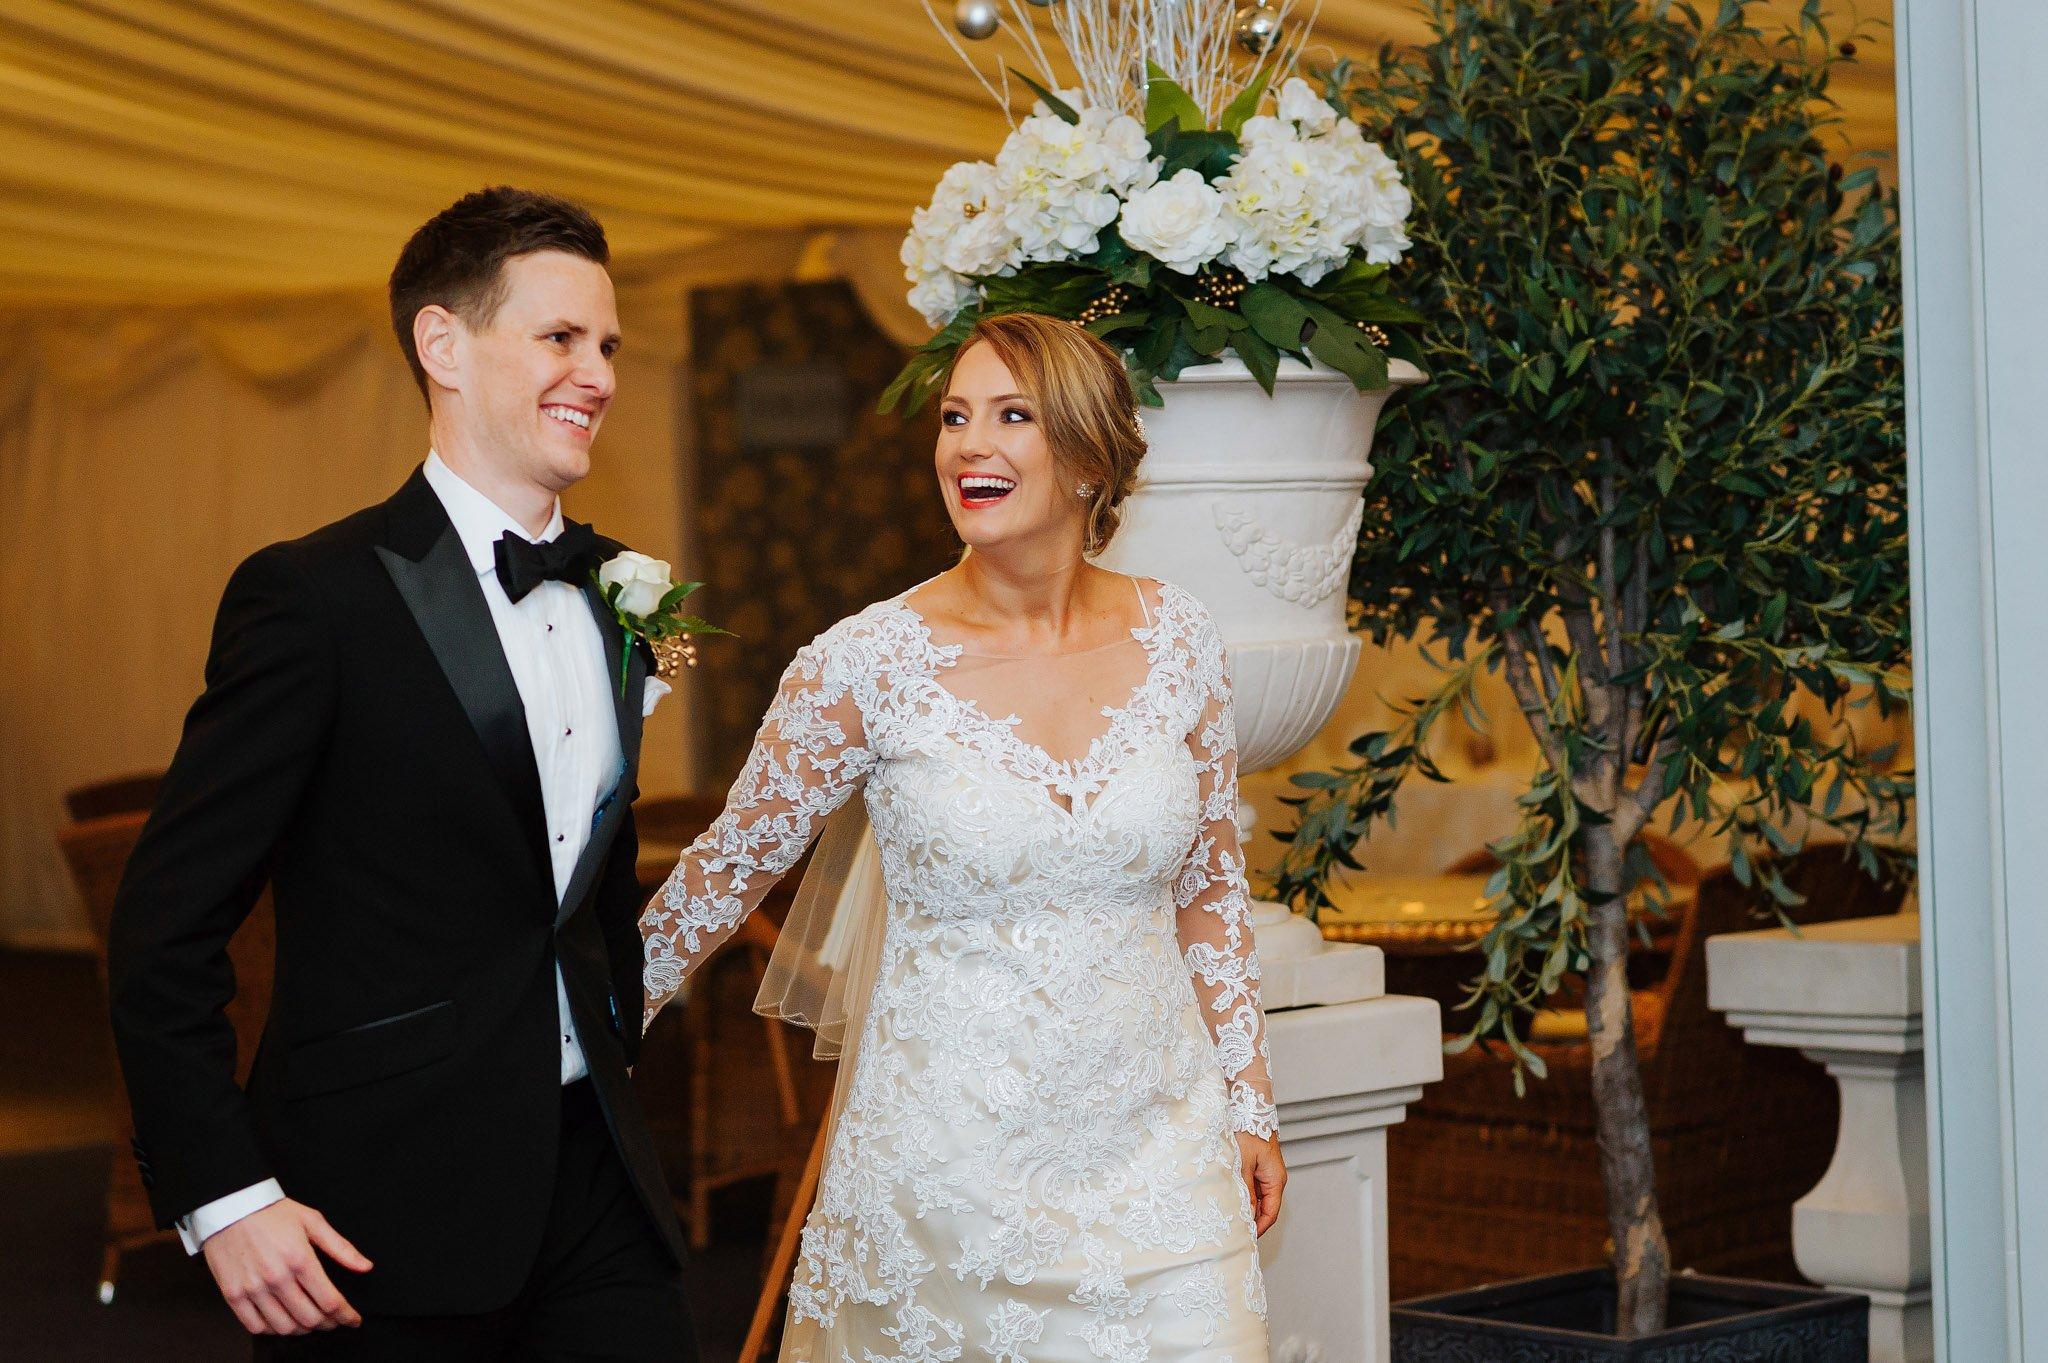 Coombe Abbey wedding in Coventry, Warwickshire - Sam + Matt 57